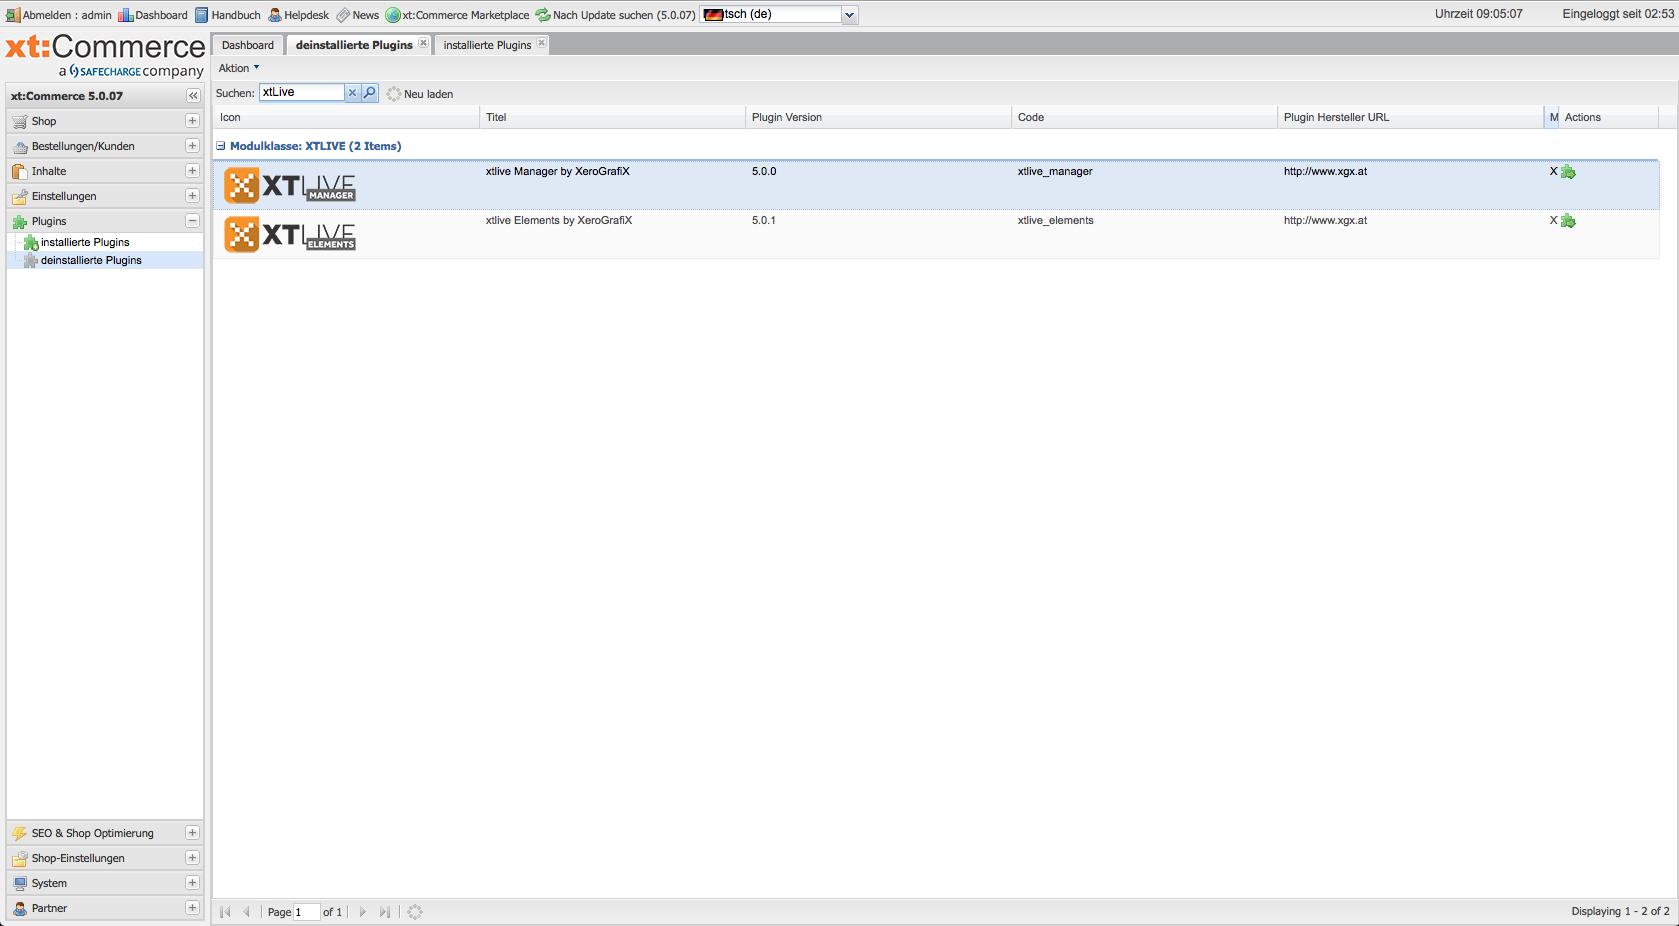 xtLive Manager und xtLive Elements sind bereits bei xt:commerce 5 enthalten, Hack4Life, Fabian Geissler, Xerografie, Test, CMS